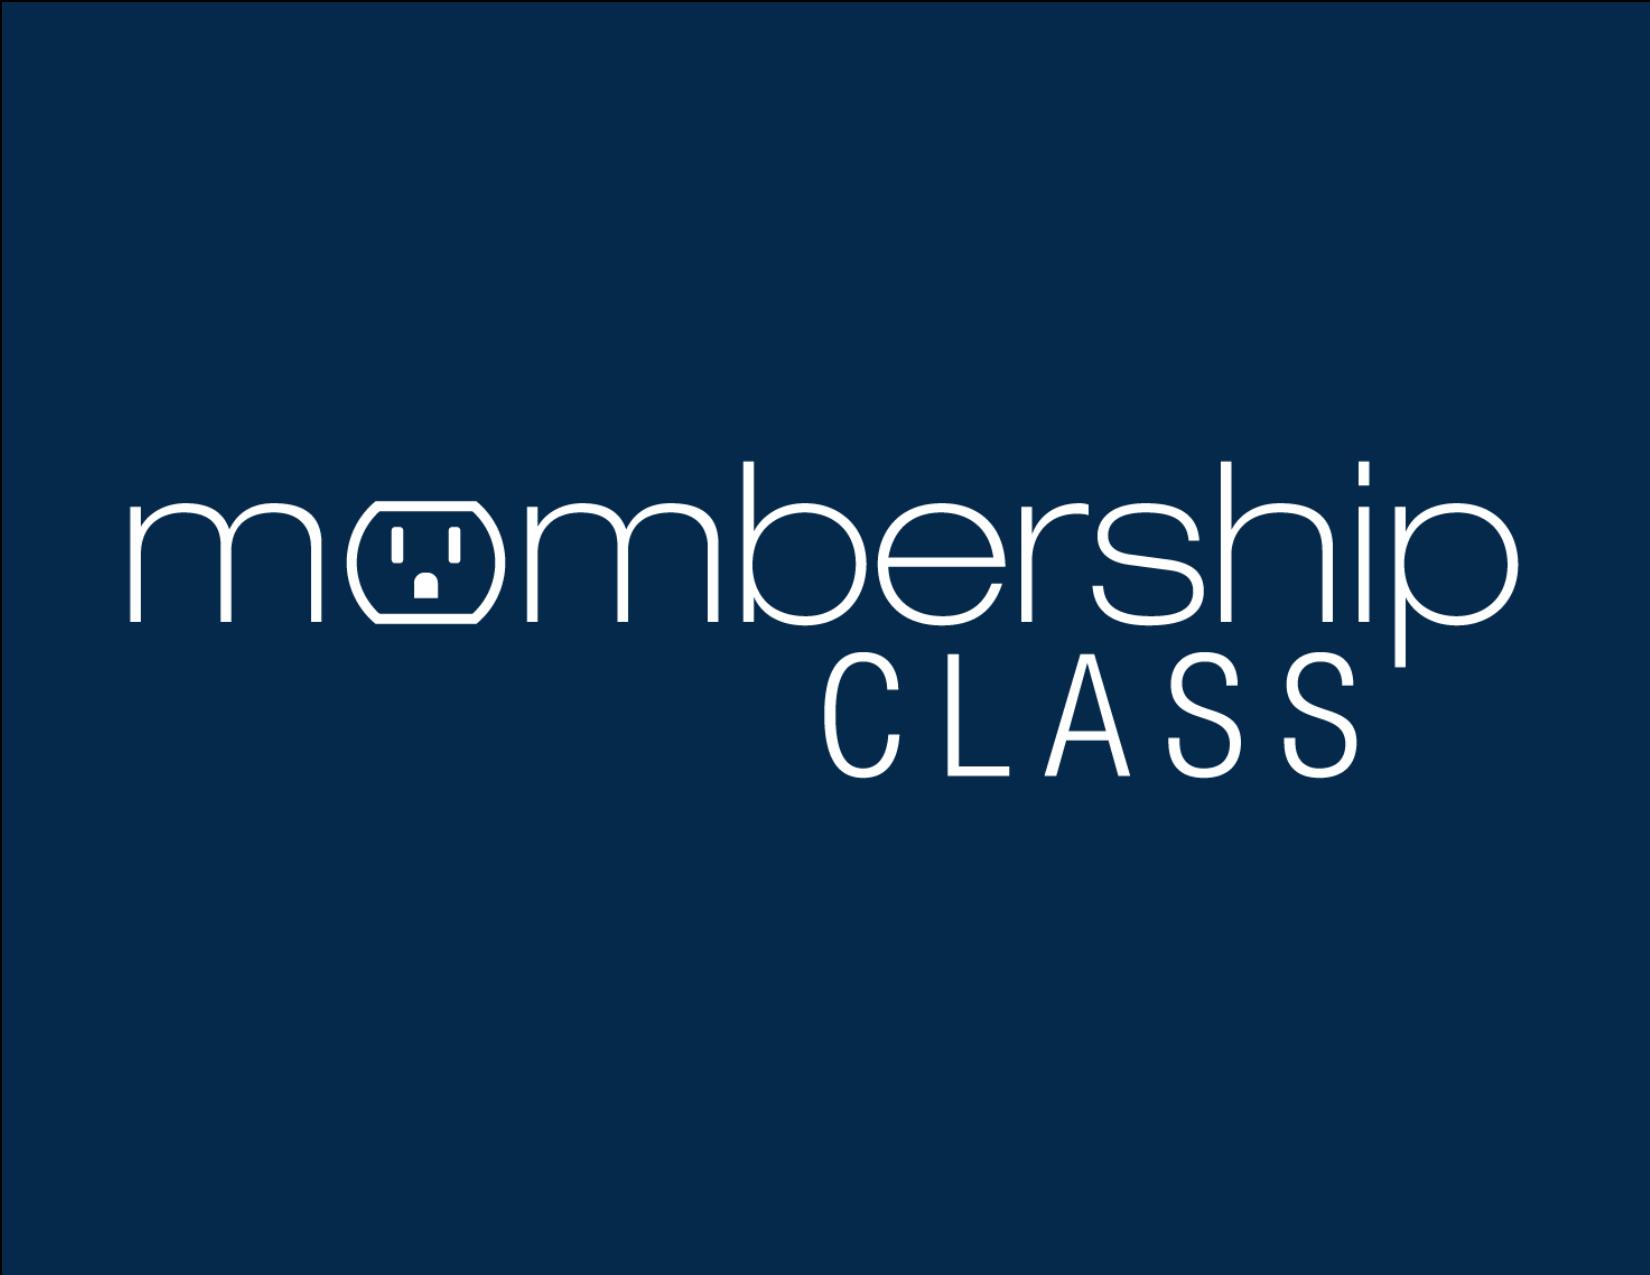 Membership class logo blue background